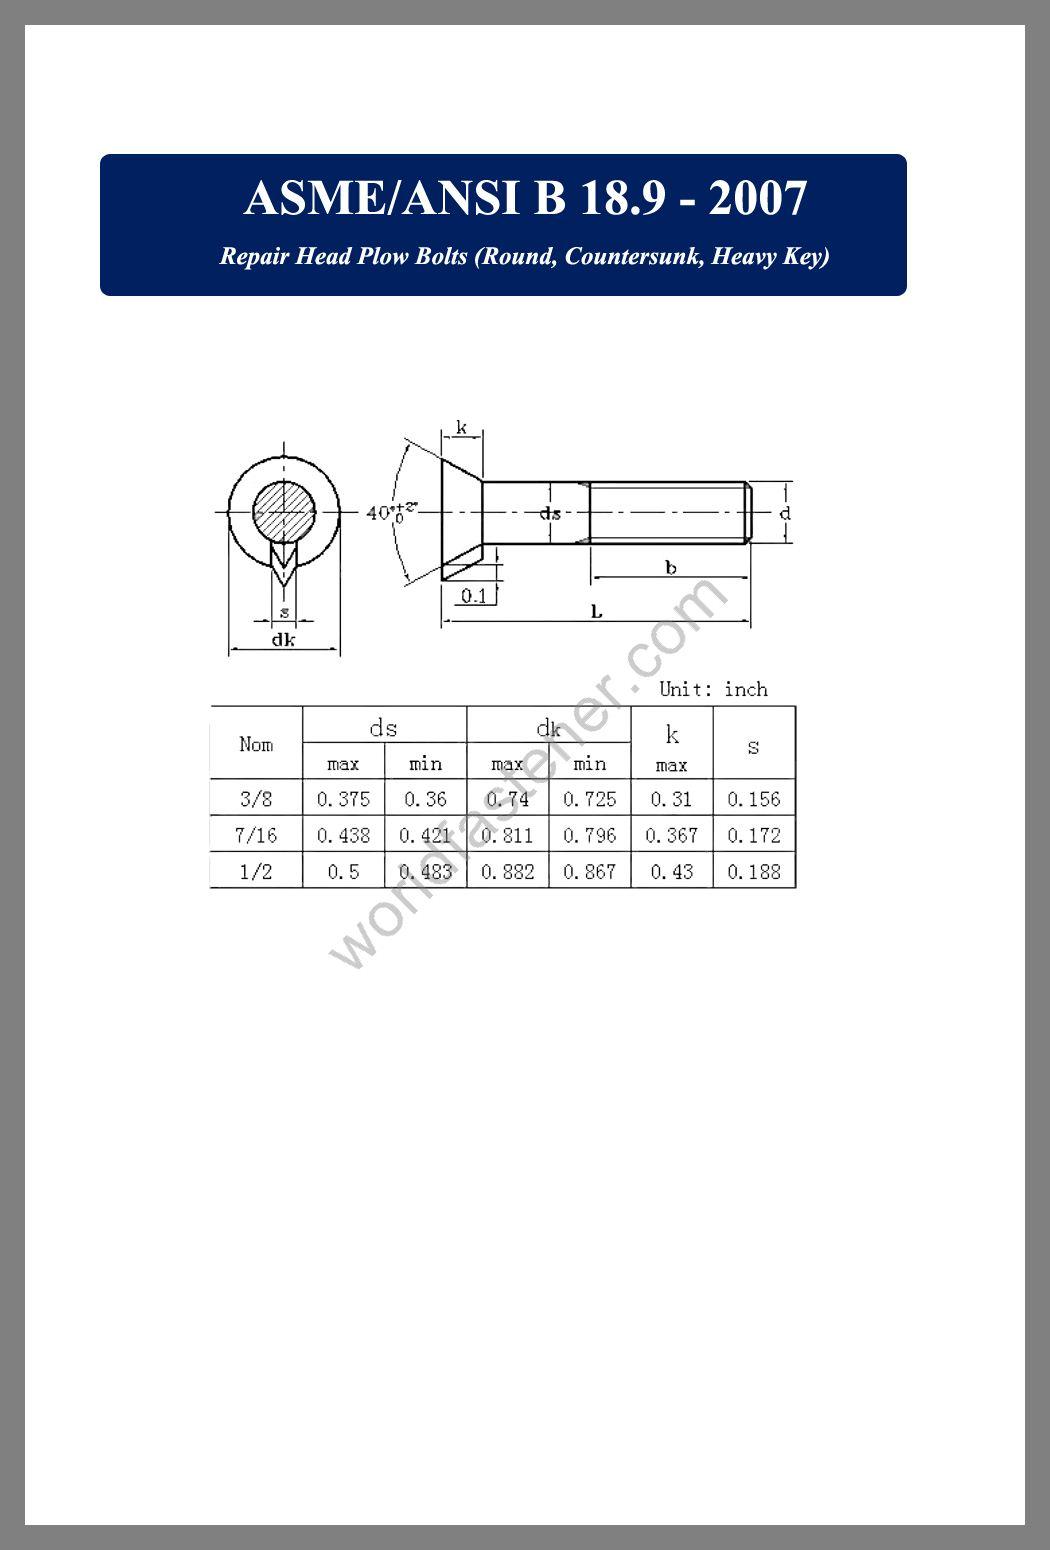 ASME-ANSI B 18.9, Countersunk Head Bolts, Countersunk Head Screws, fastener, screw, bolt, asme-ansi bolts, asme-ansi screws